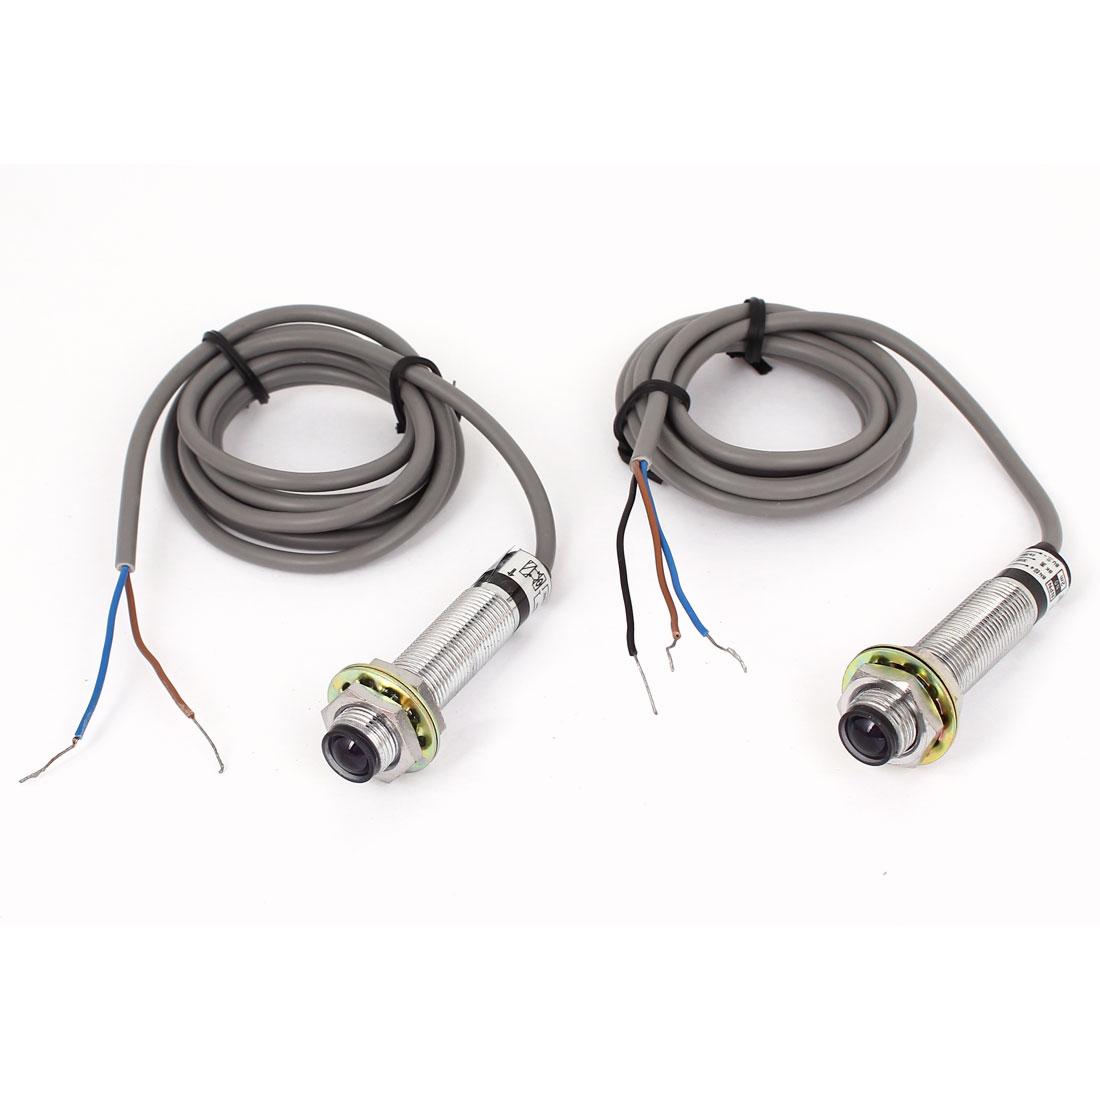 DC 3 Wire 6-36V NPN NO Transmitter Receiver Photoelectric Sensor 2M